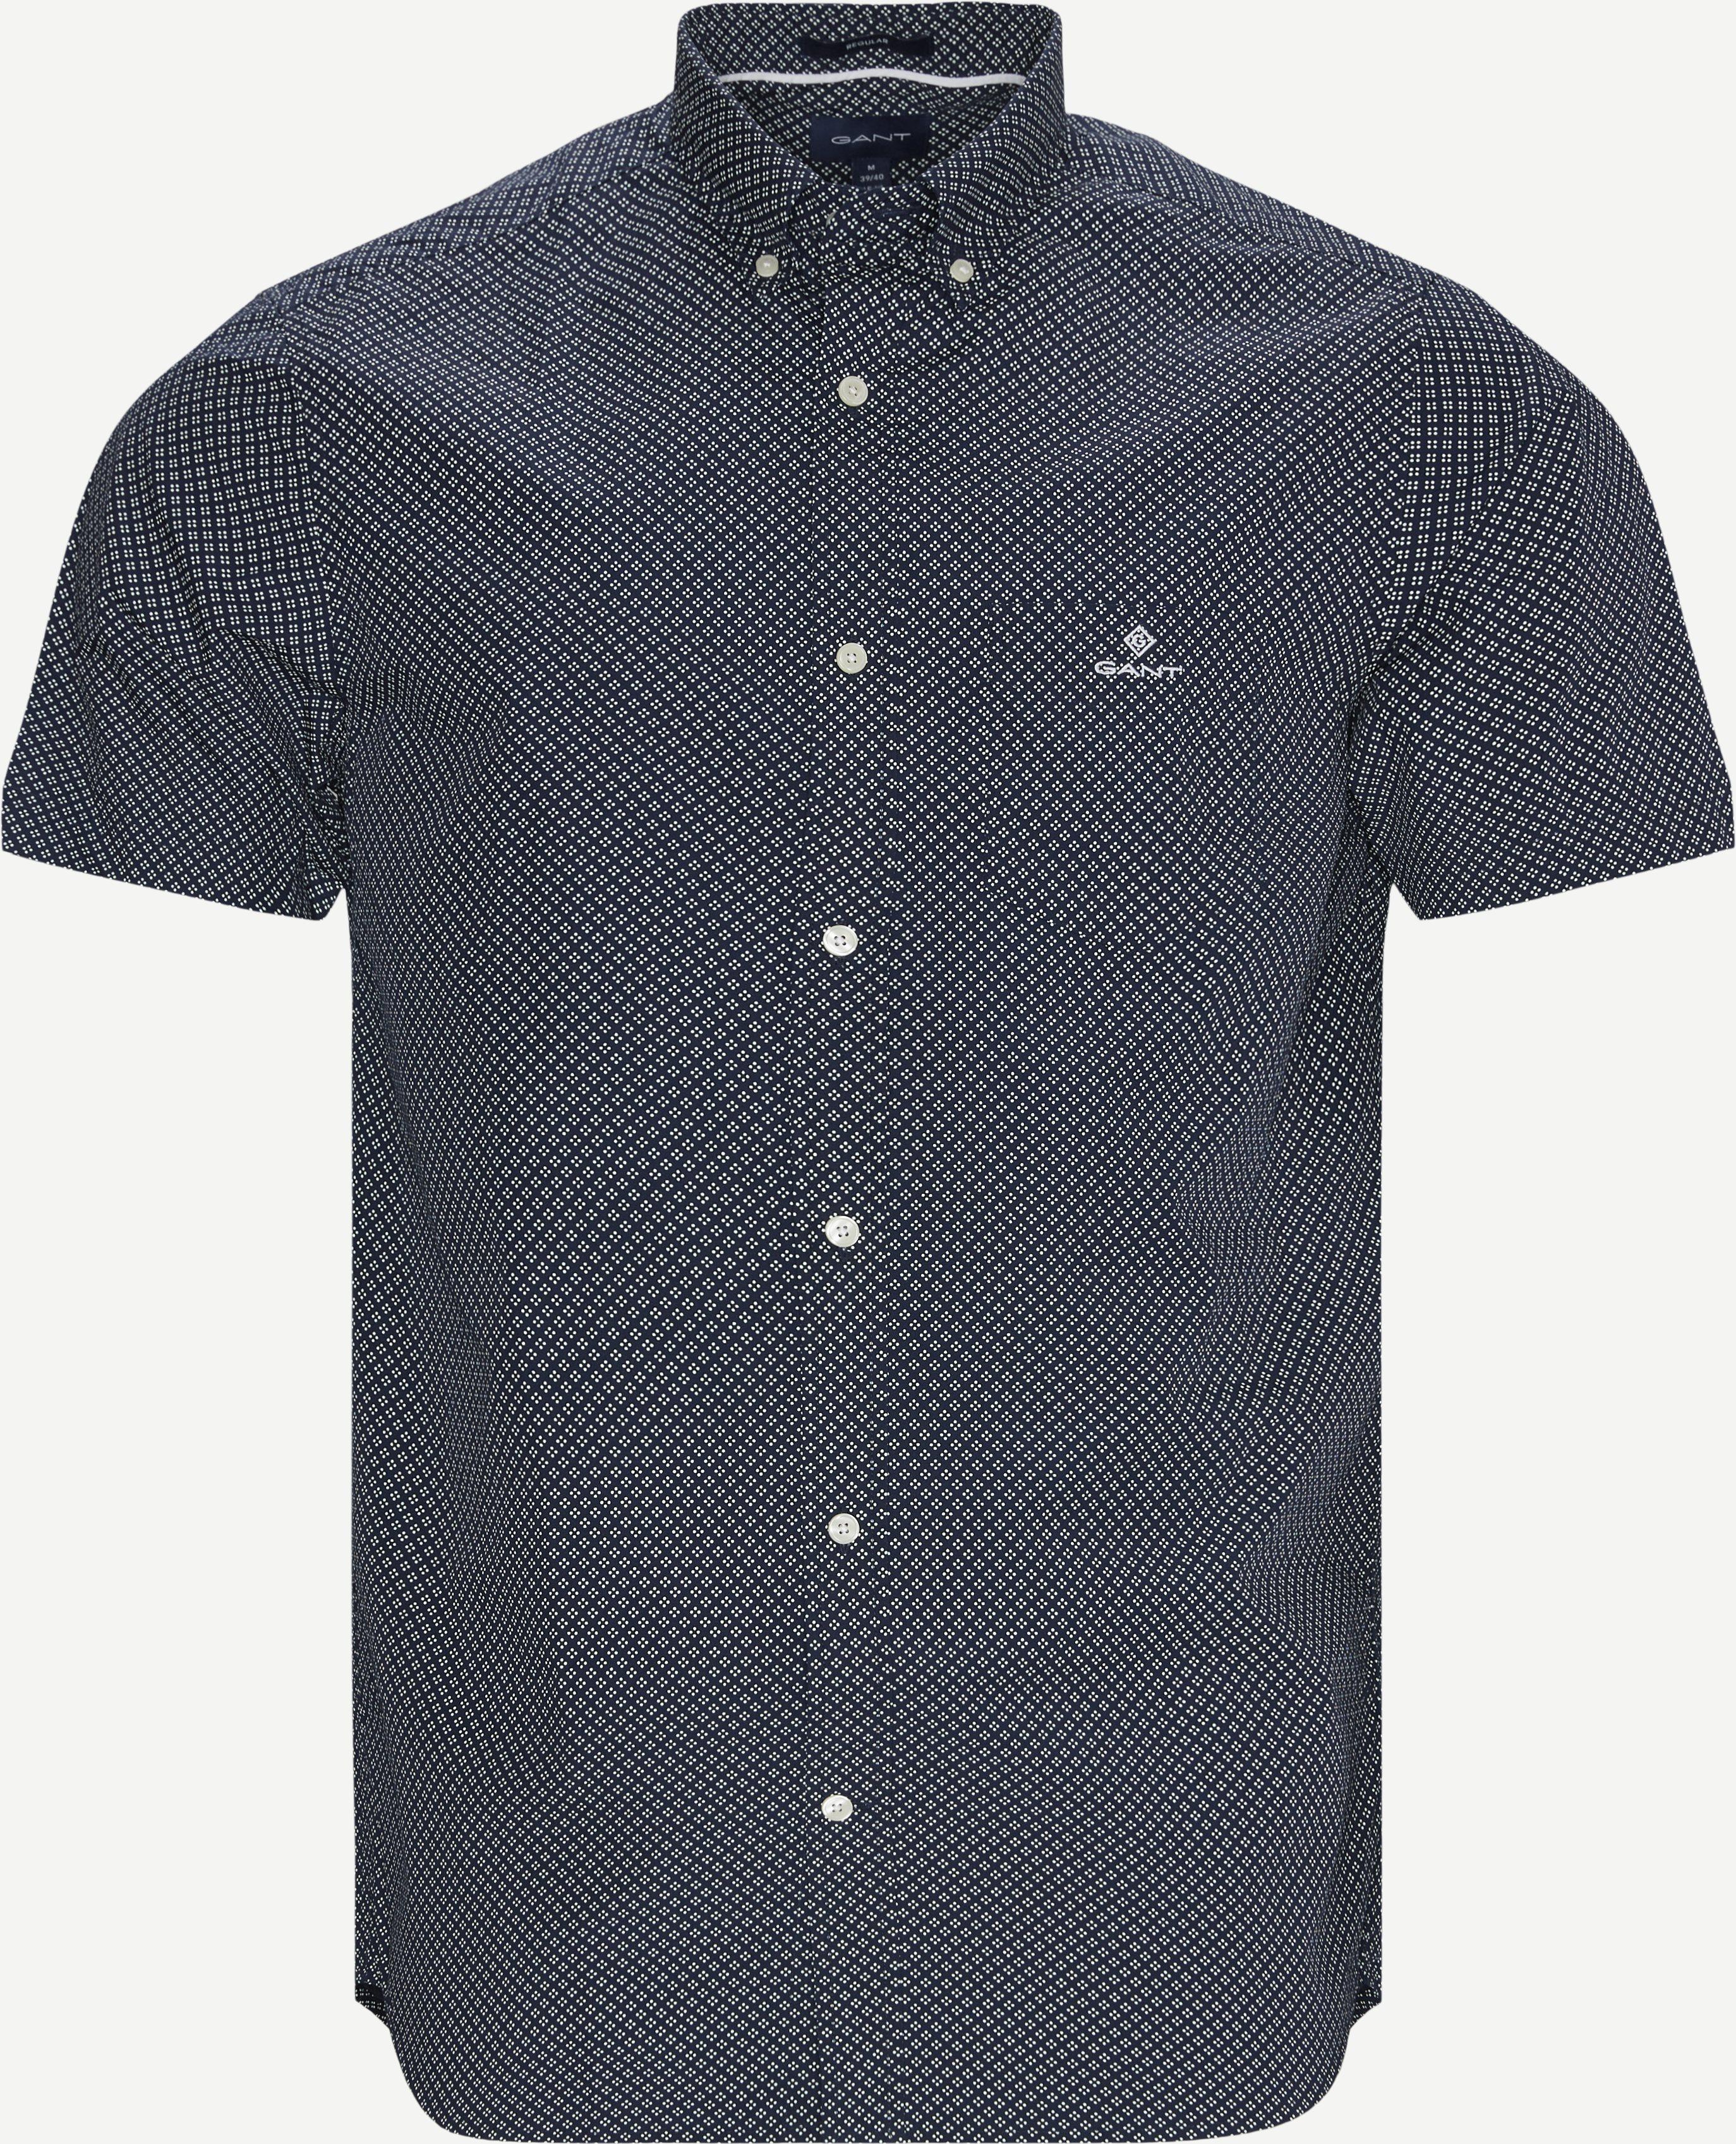 Reg Micro Dot K/Æ Skjorte  - Kortärmade skjortor - Regular - Blå